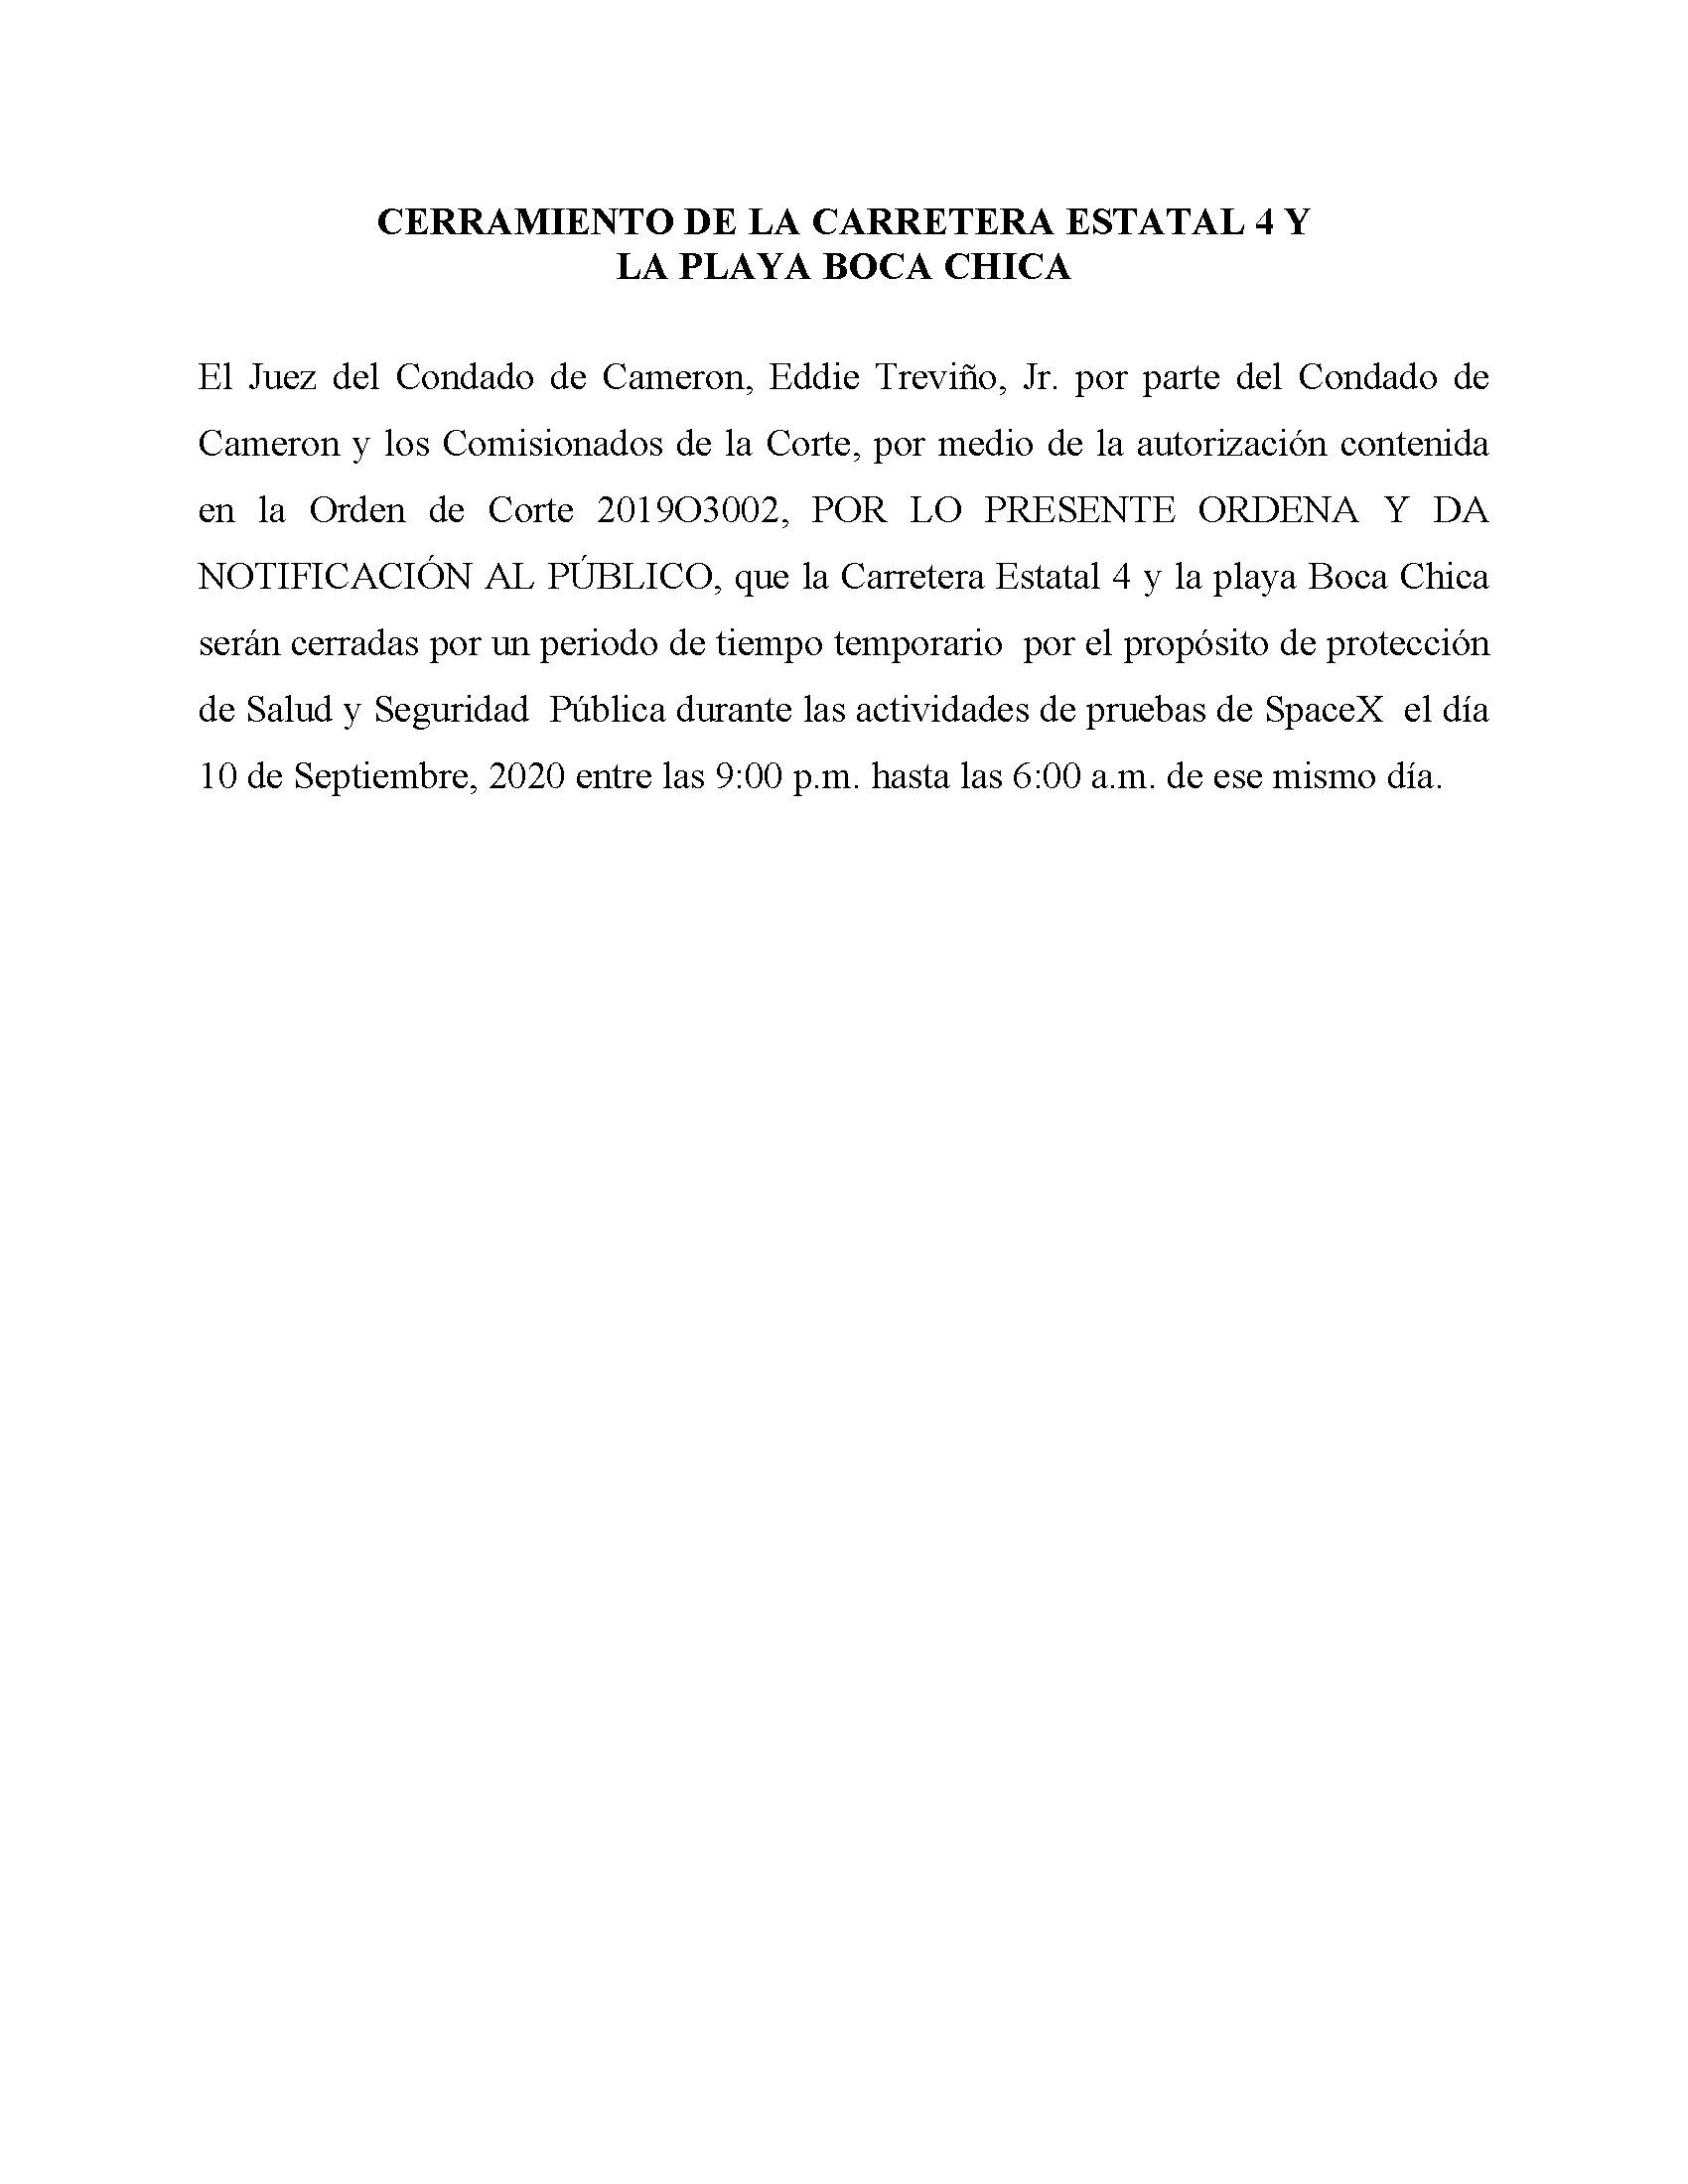 ORDER.CLOSURE OF HIGHWAY 4 Y LA PLAYA BOCA CHICA.SPANISH.9.10.20